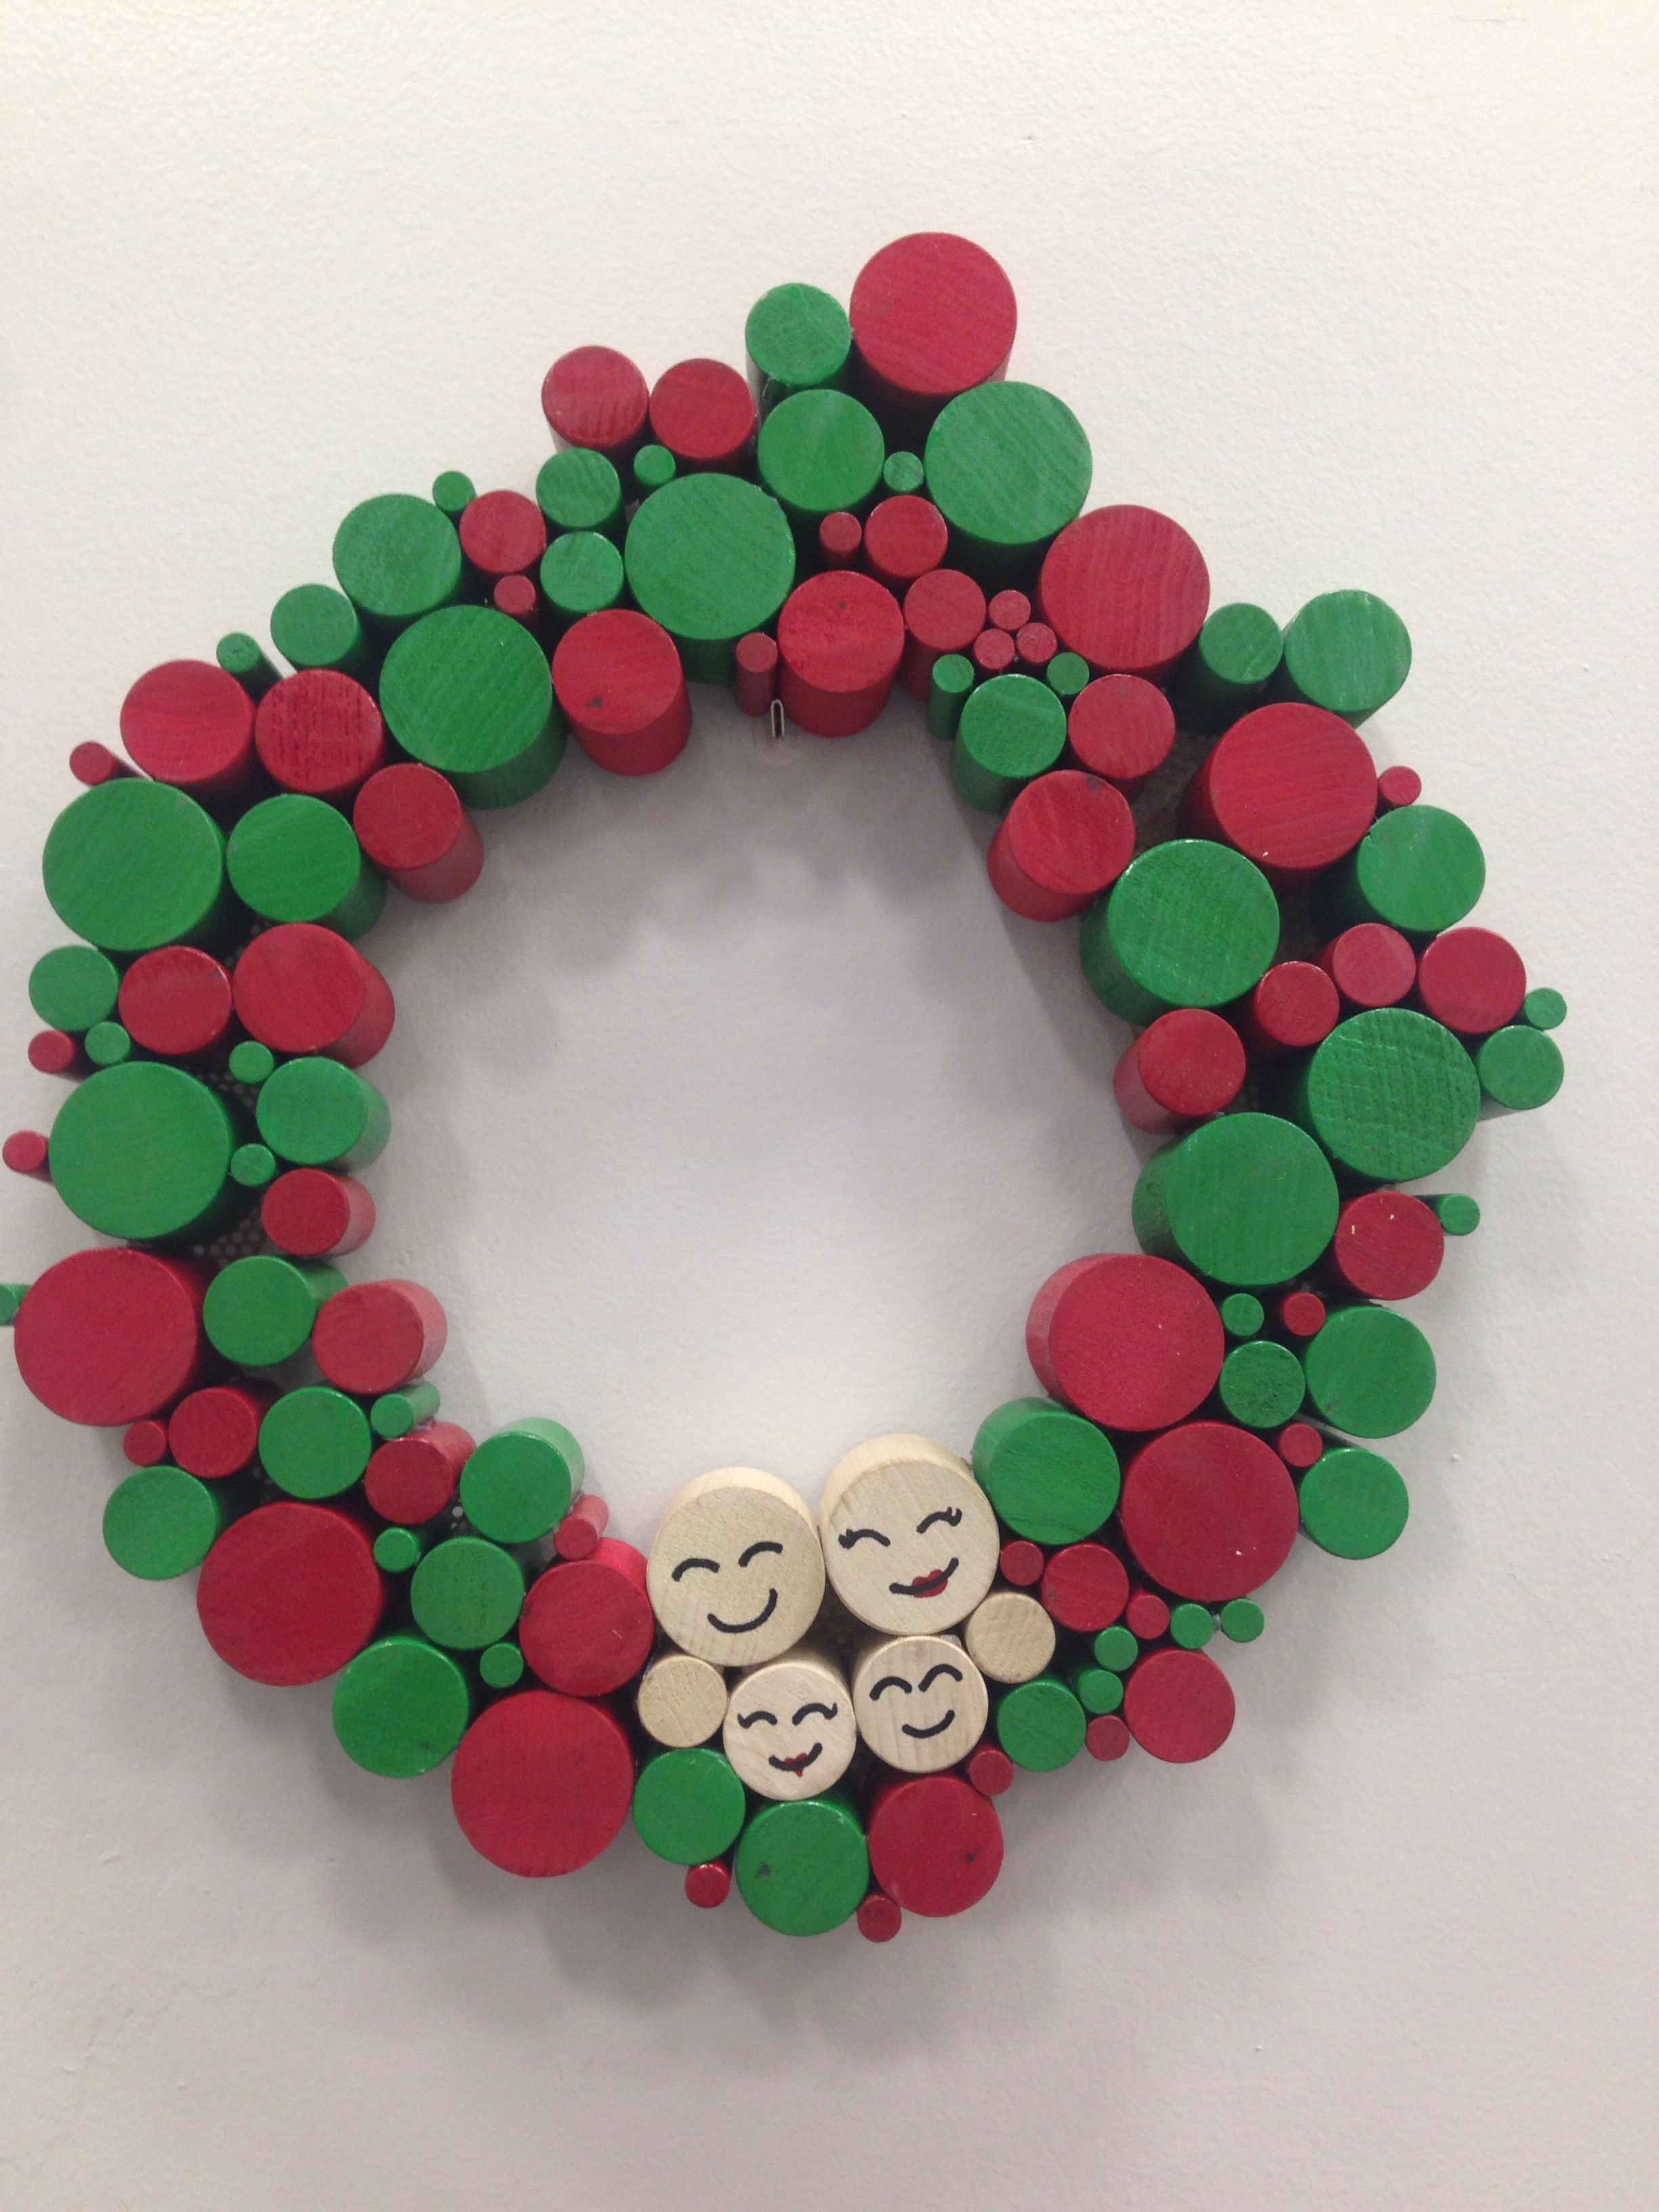 Wooden Dowel Christmas Wreath Httpwwwlowescomcreative